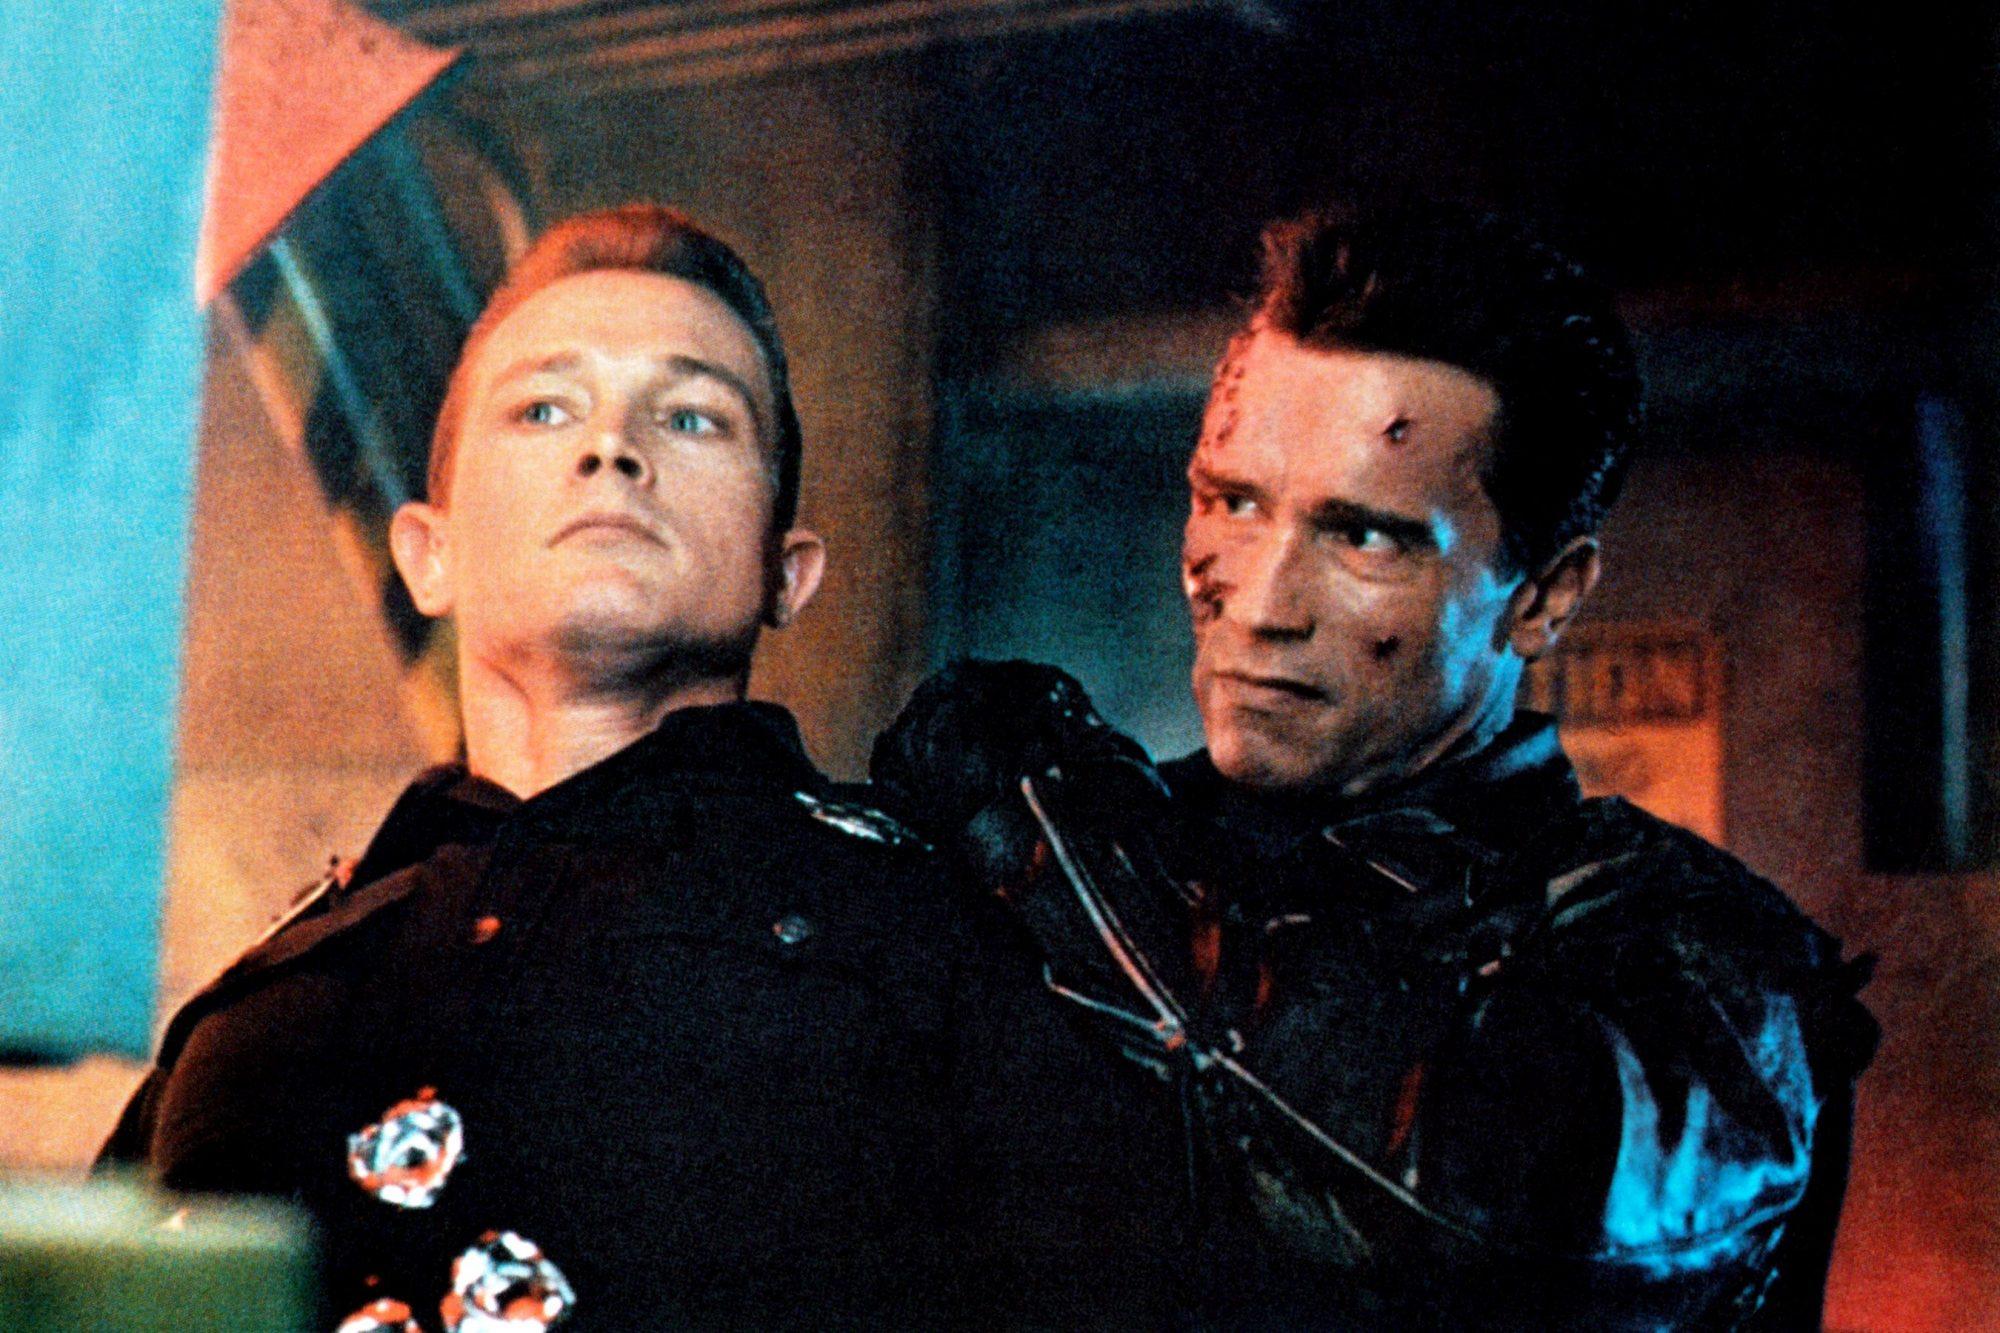 TERMINATOR 2: JUDGMENT DAY, from left: Robert Patrick, Arnold Schwarzenegger, 1991. ©TriStar Picture